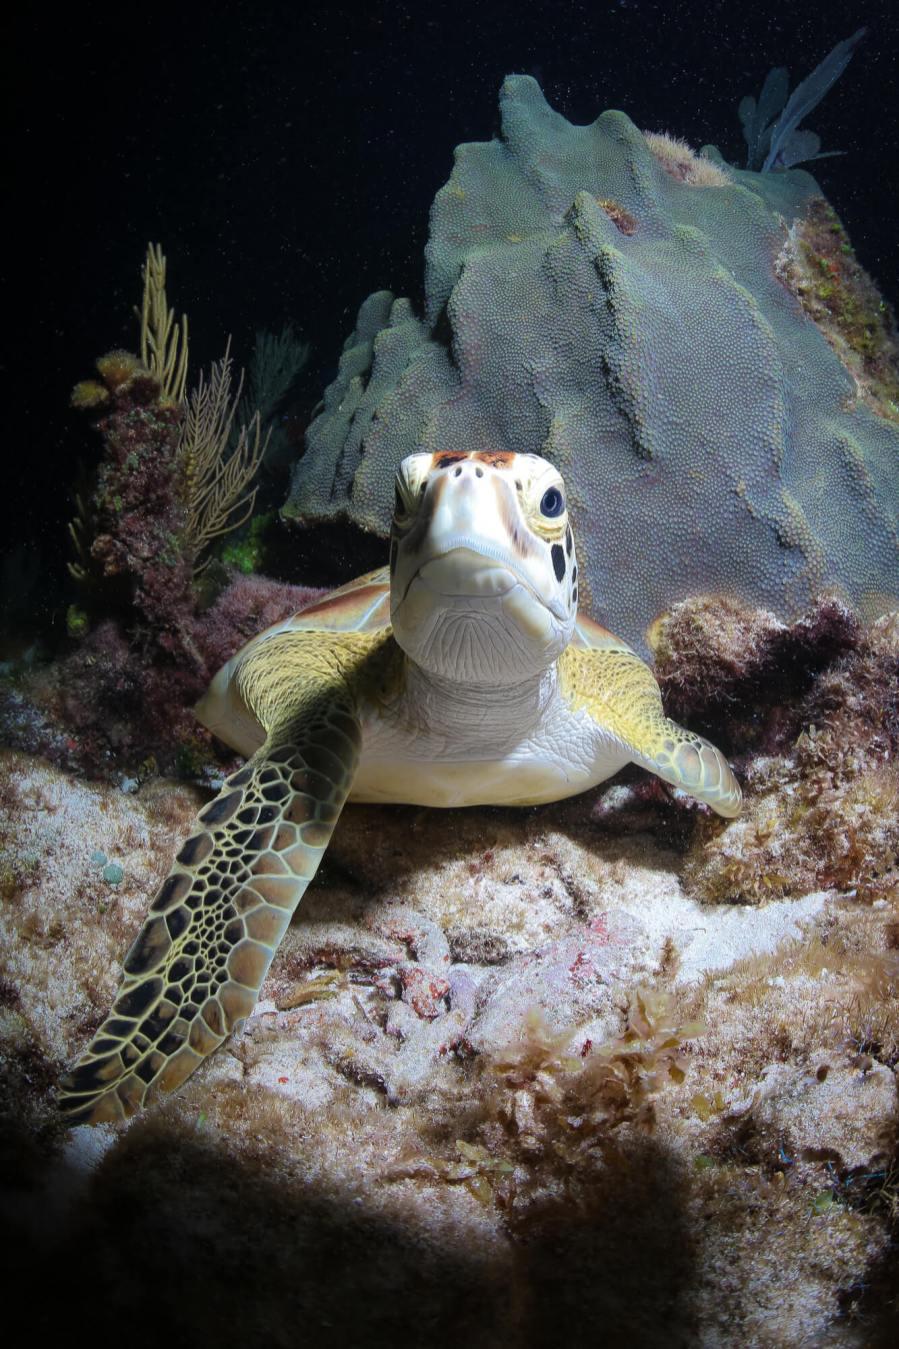 Sea Turtle, Cancun Mexico. Photo credit Tre' Packard 2017.